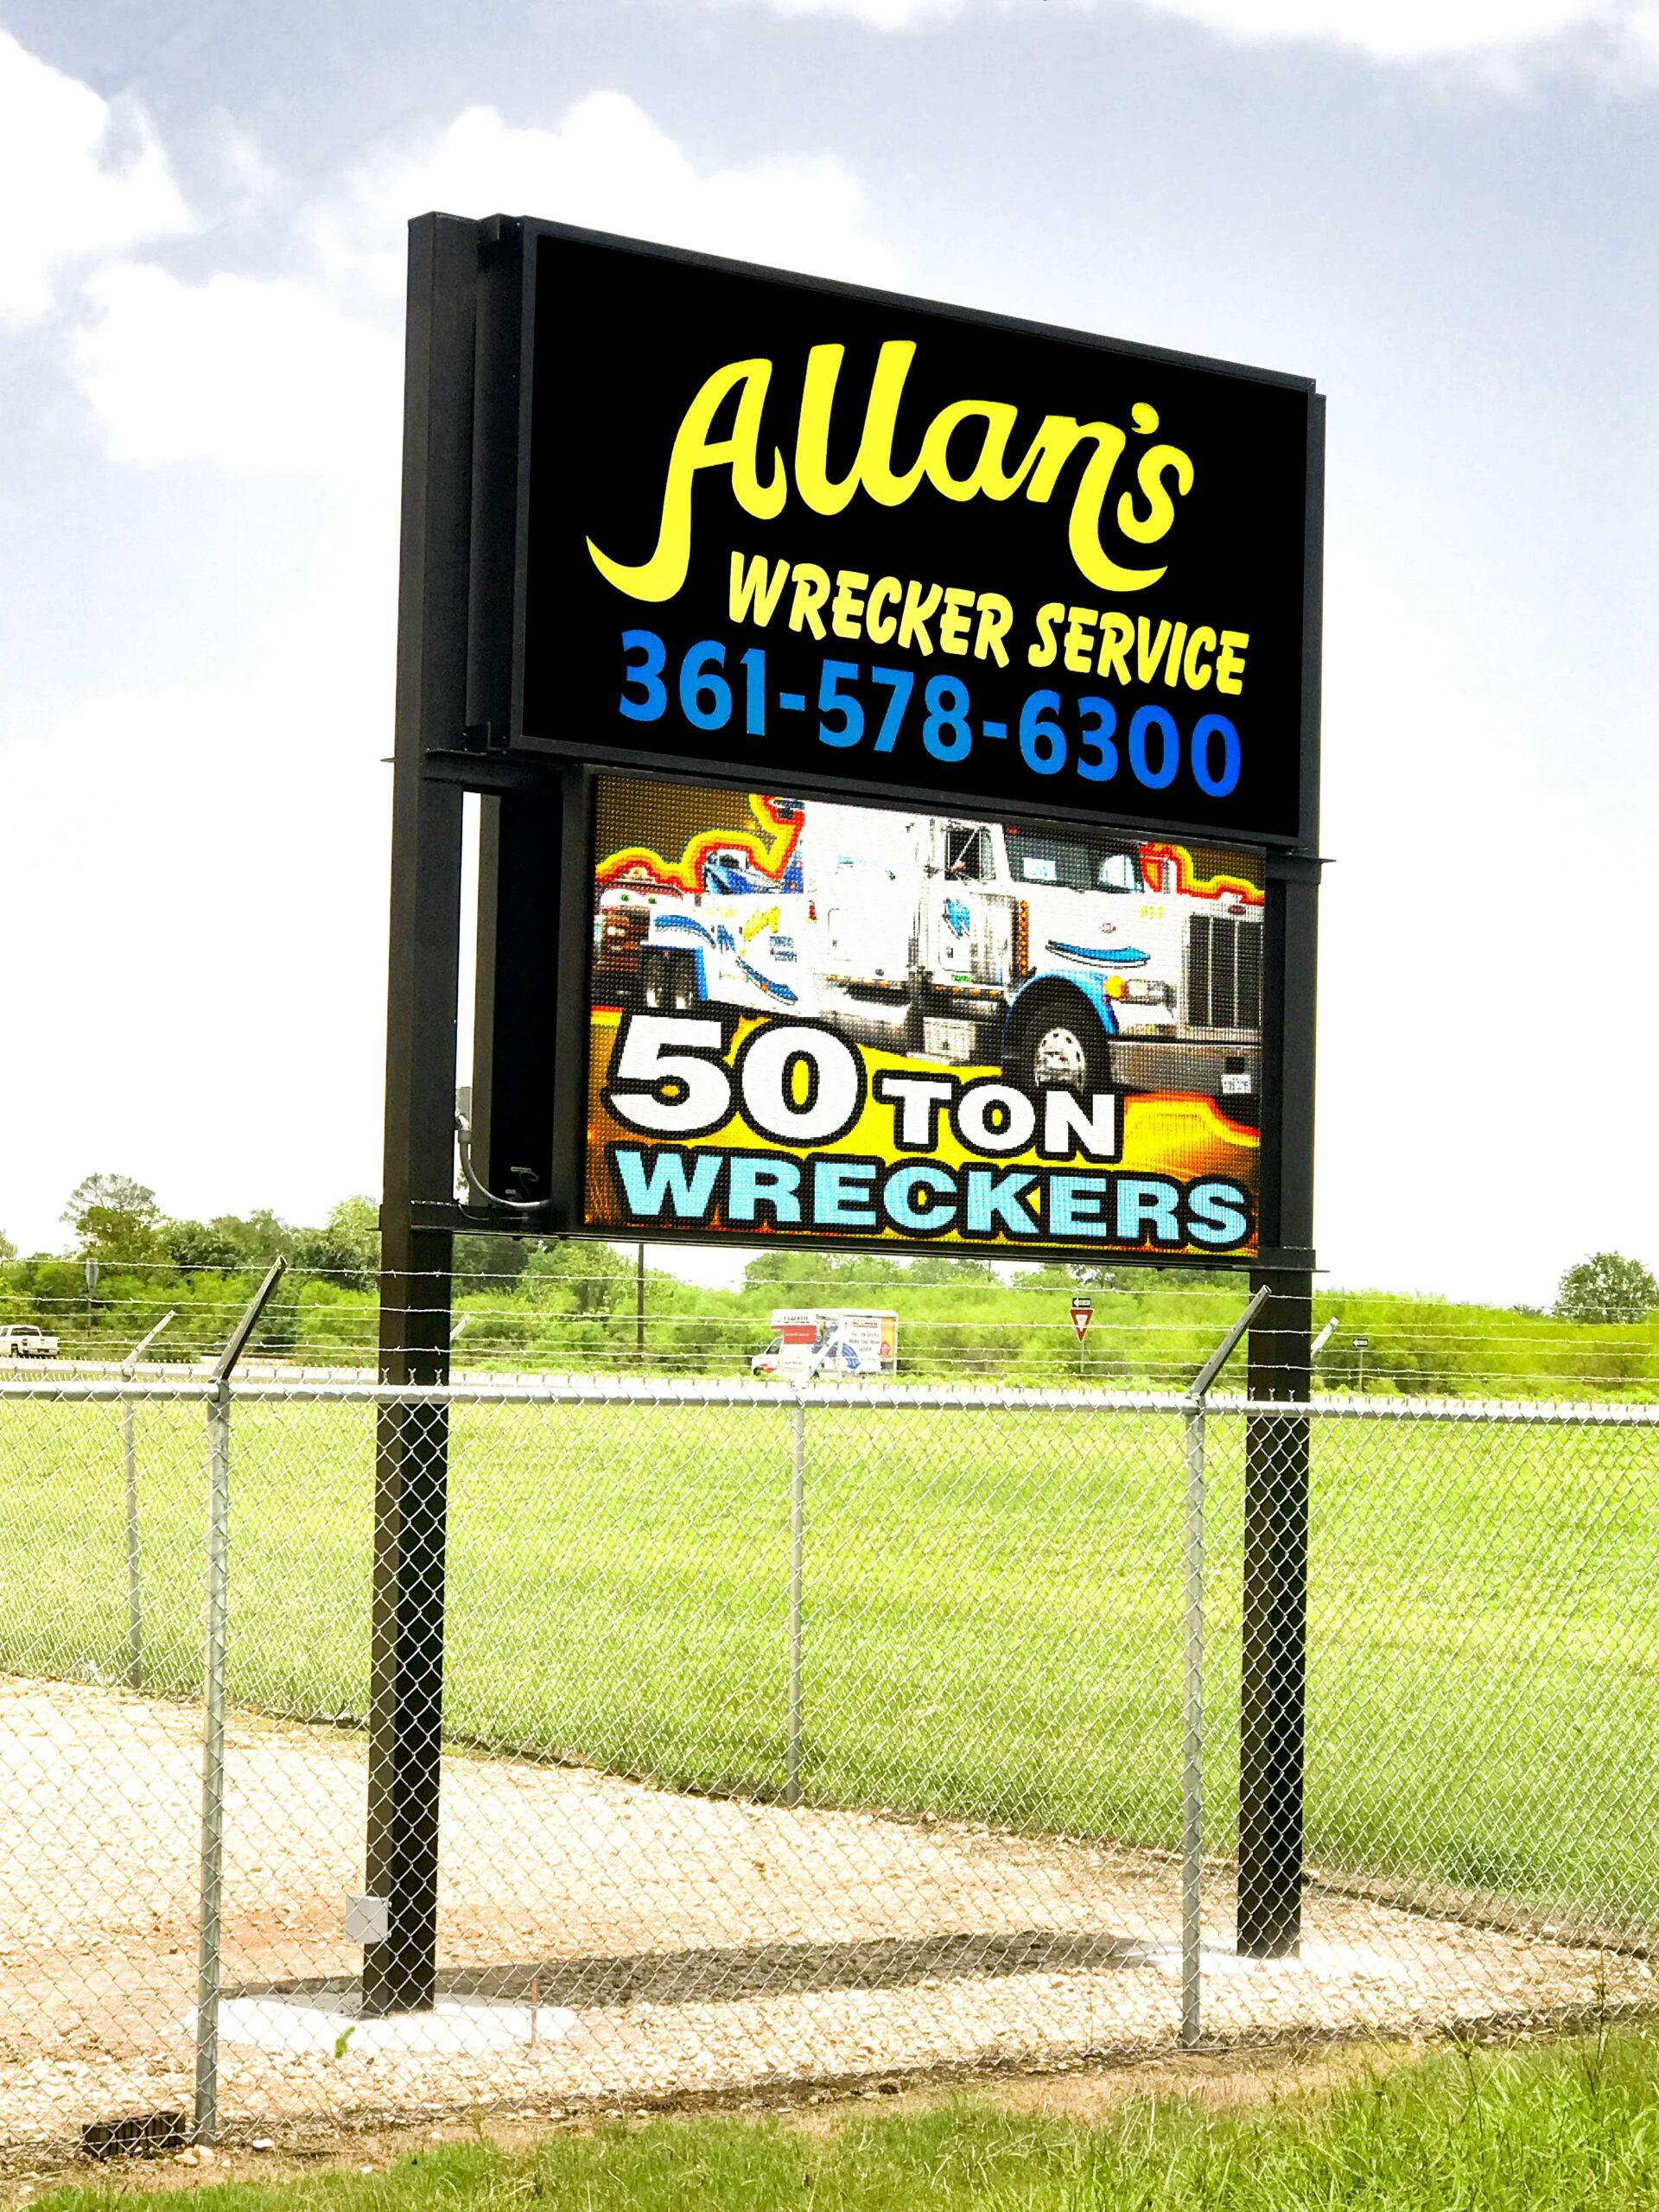 Allan's Wrecker Service